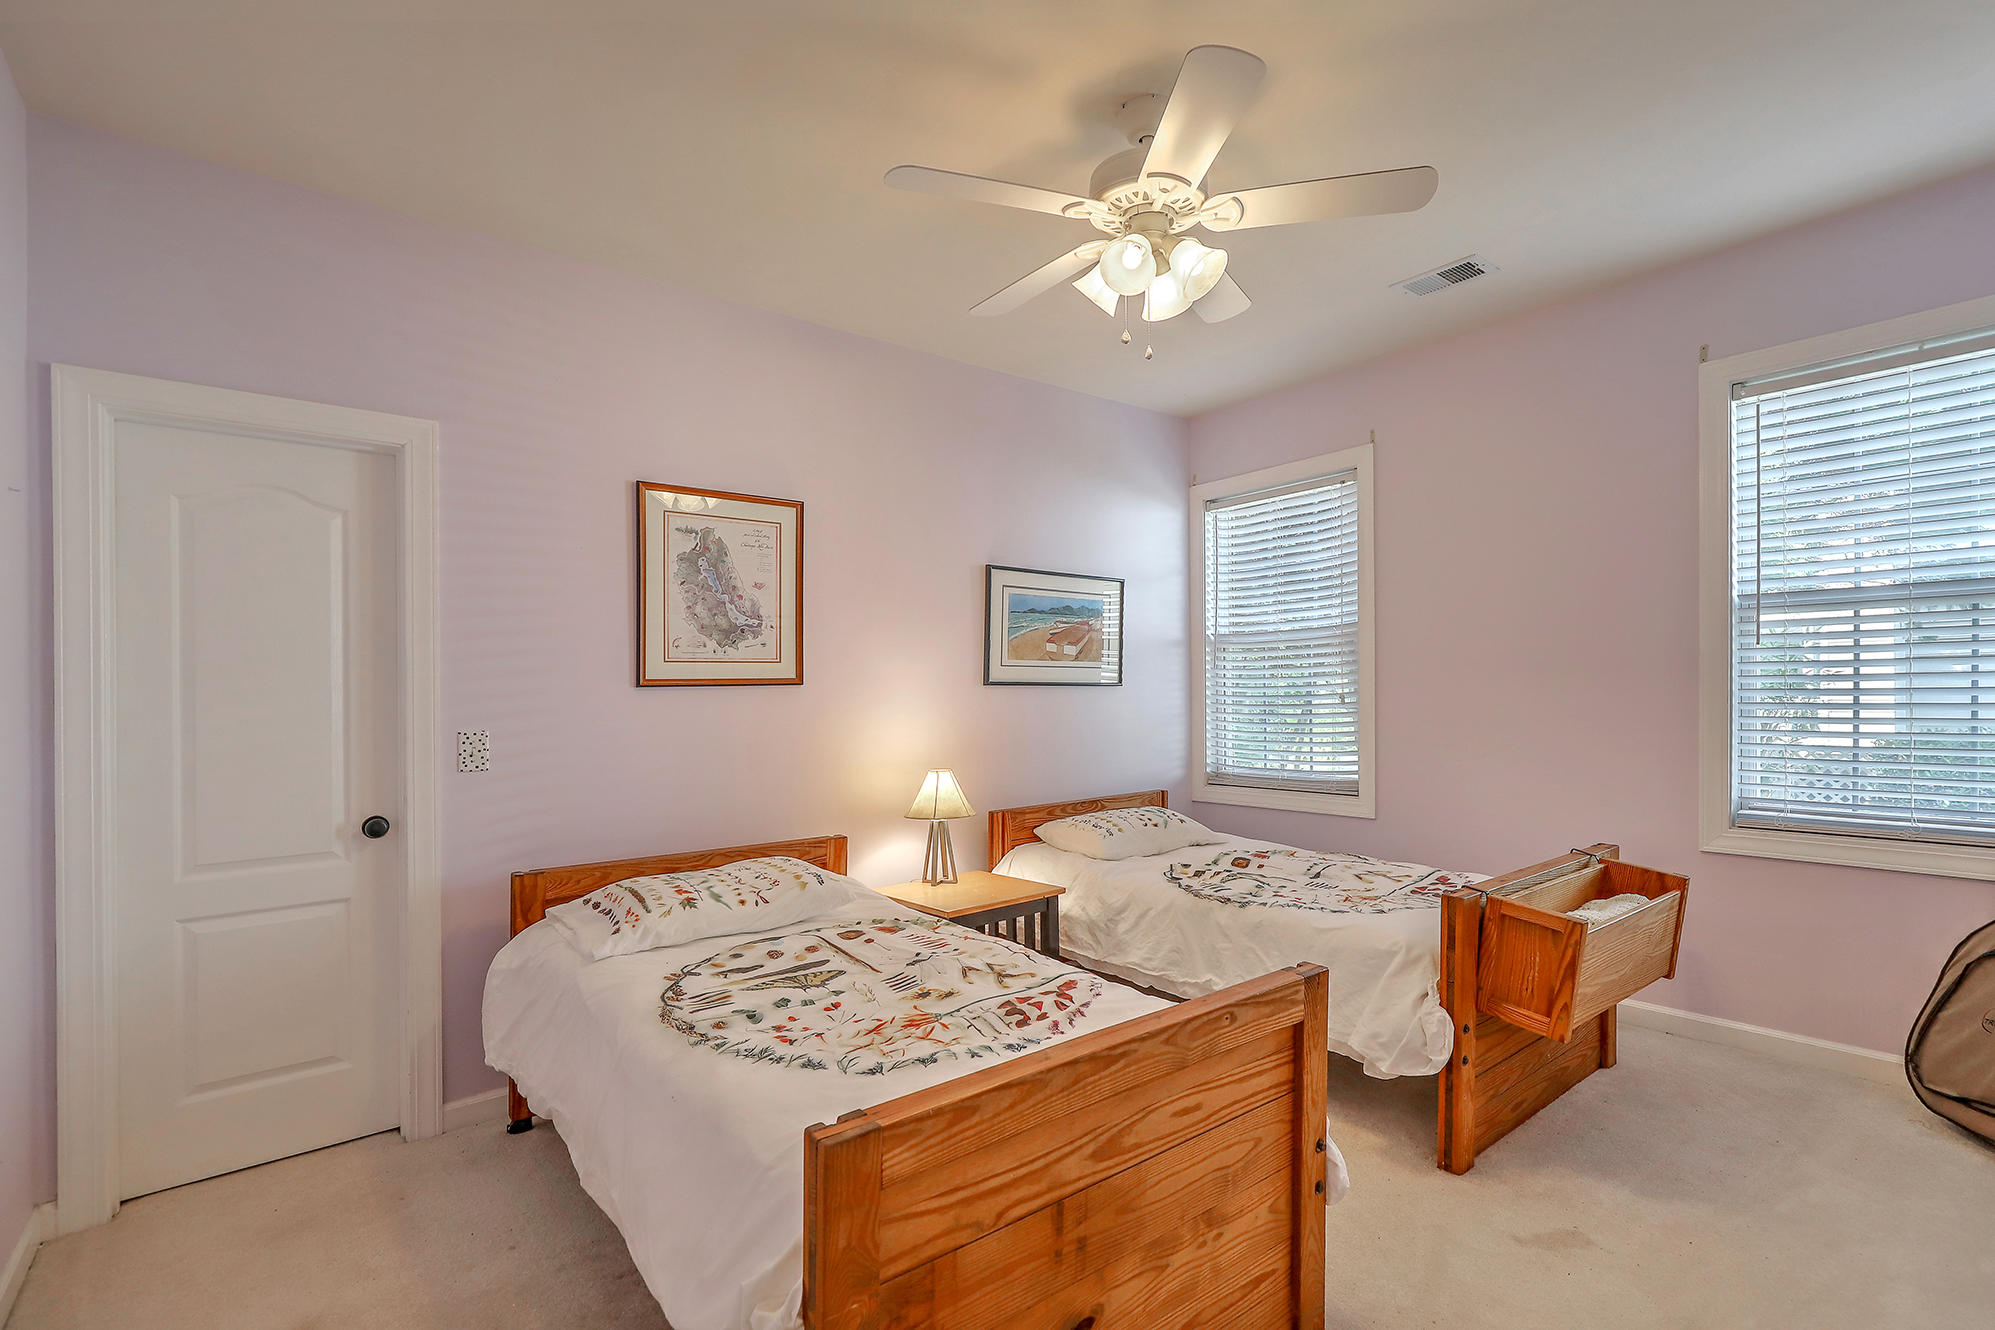 Seaside Farms Homes For Sale - 1244 Palmetto Peninsula, Mount Pleasant, SC - 23